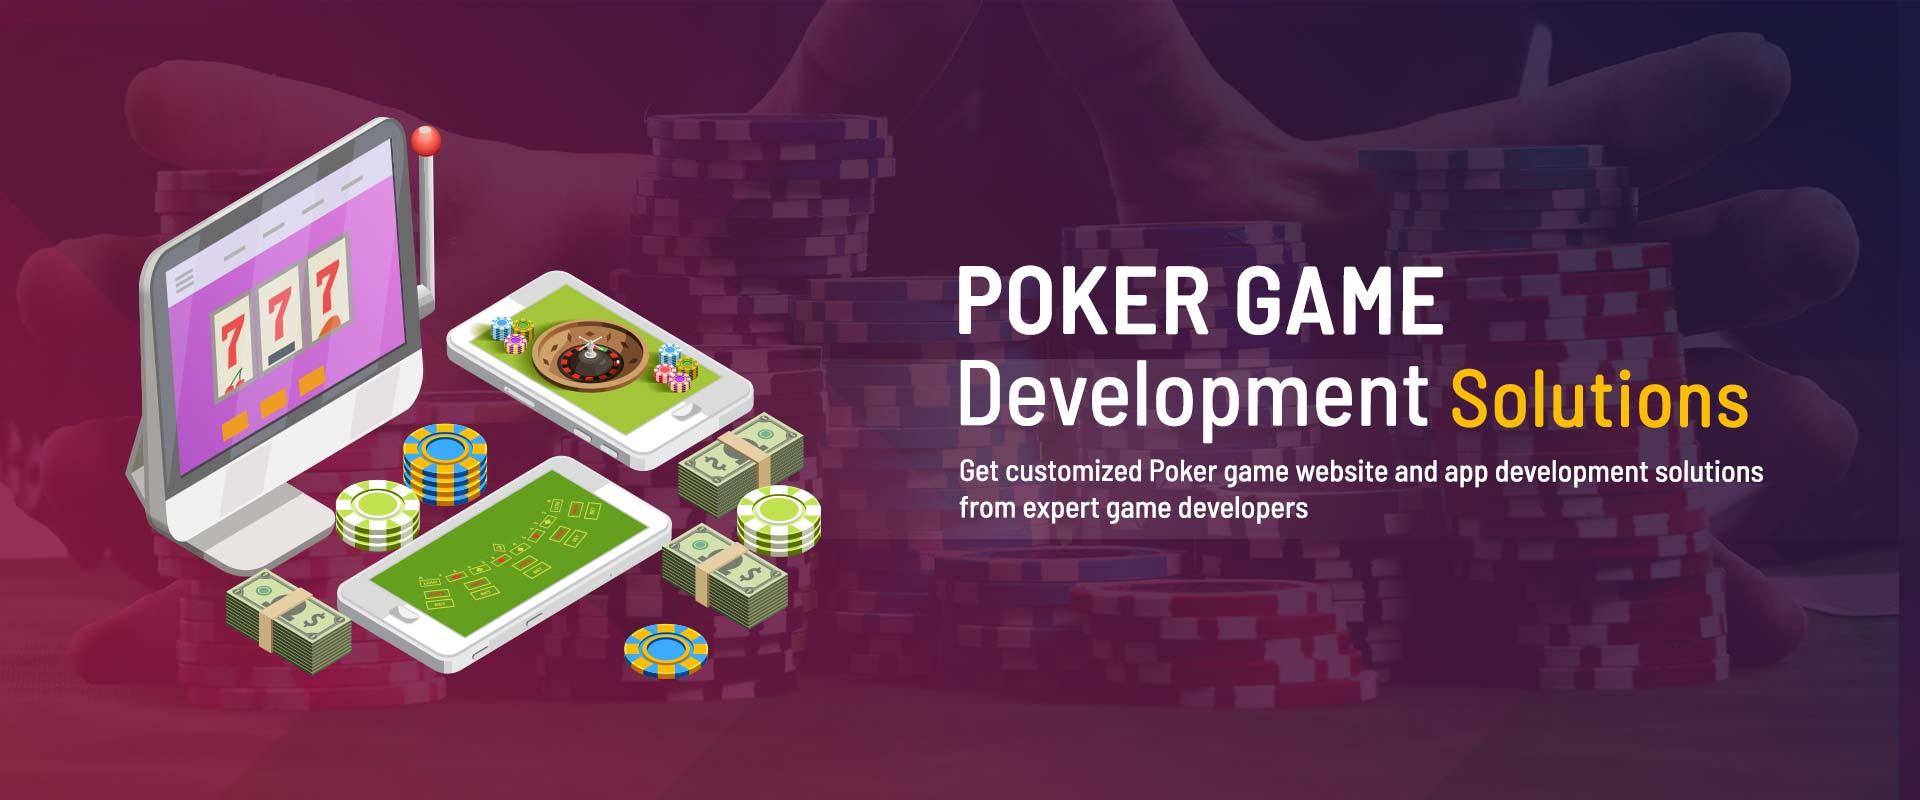 11643poker-game-development-company.jpg